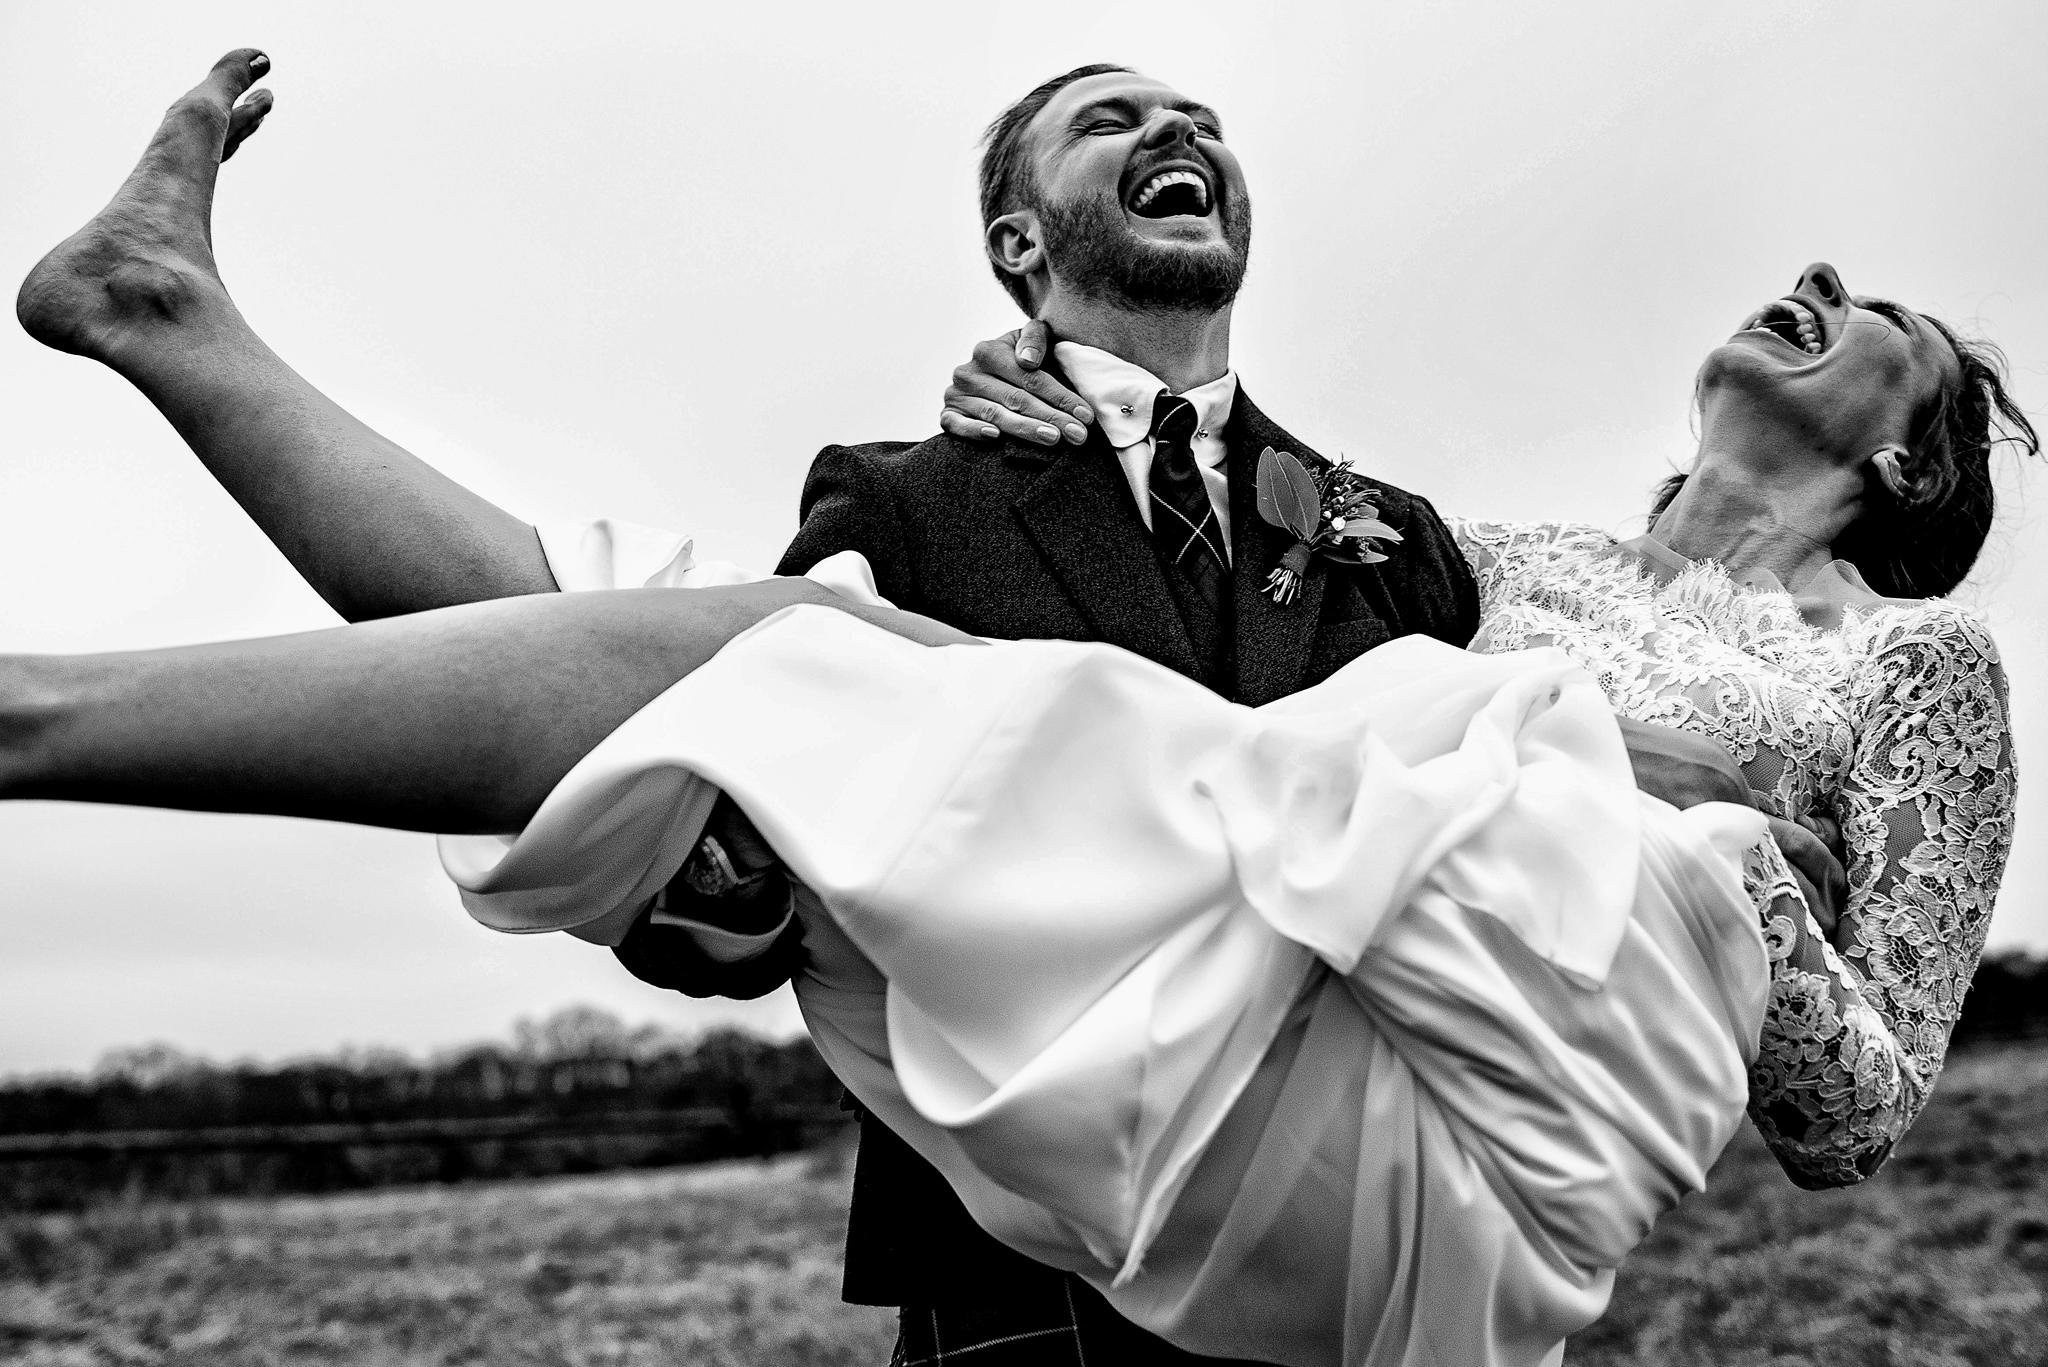 Joyful, candid wedding portrait photographed by Rich Howman